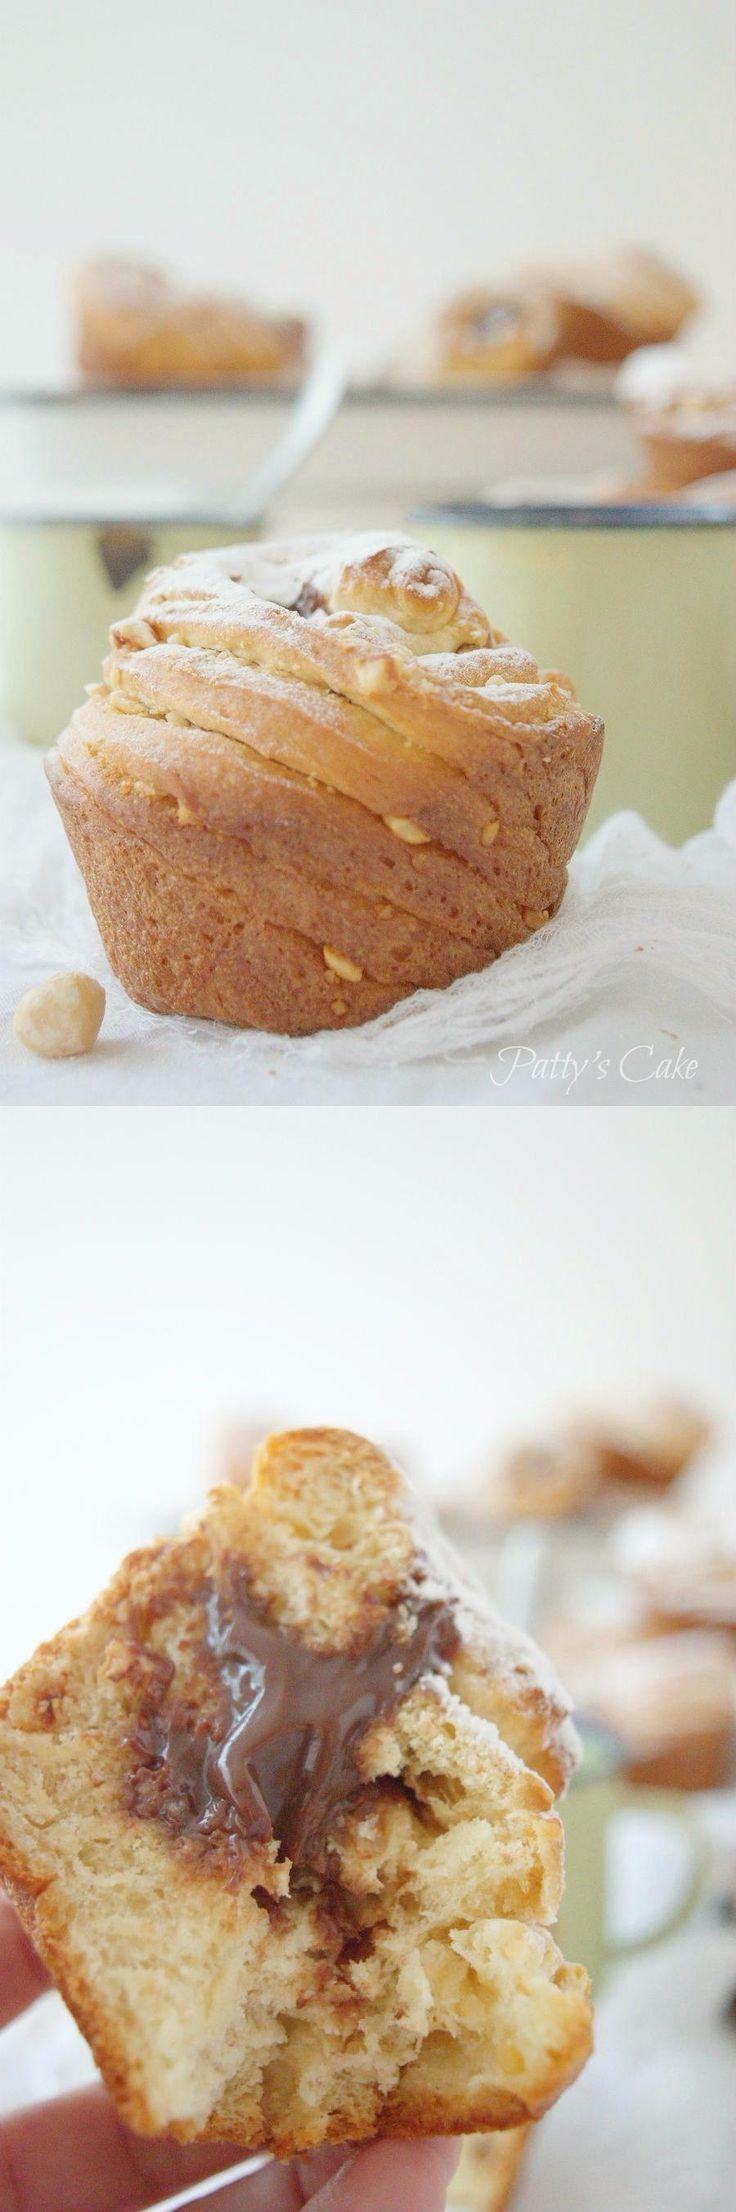 Cruffins rellenos con avellanas y chocolate / http://pattyscake-pbb.blogspot.com.es/